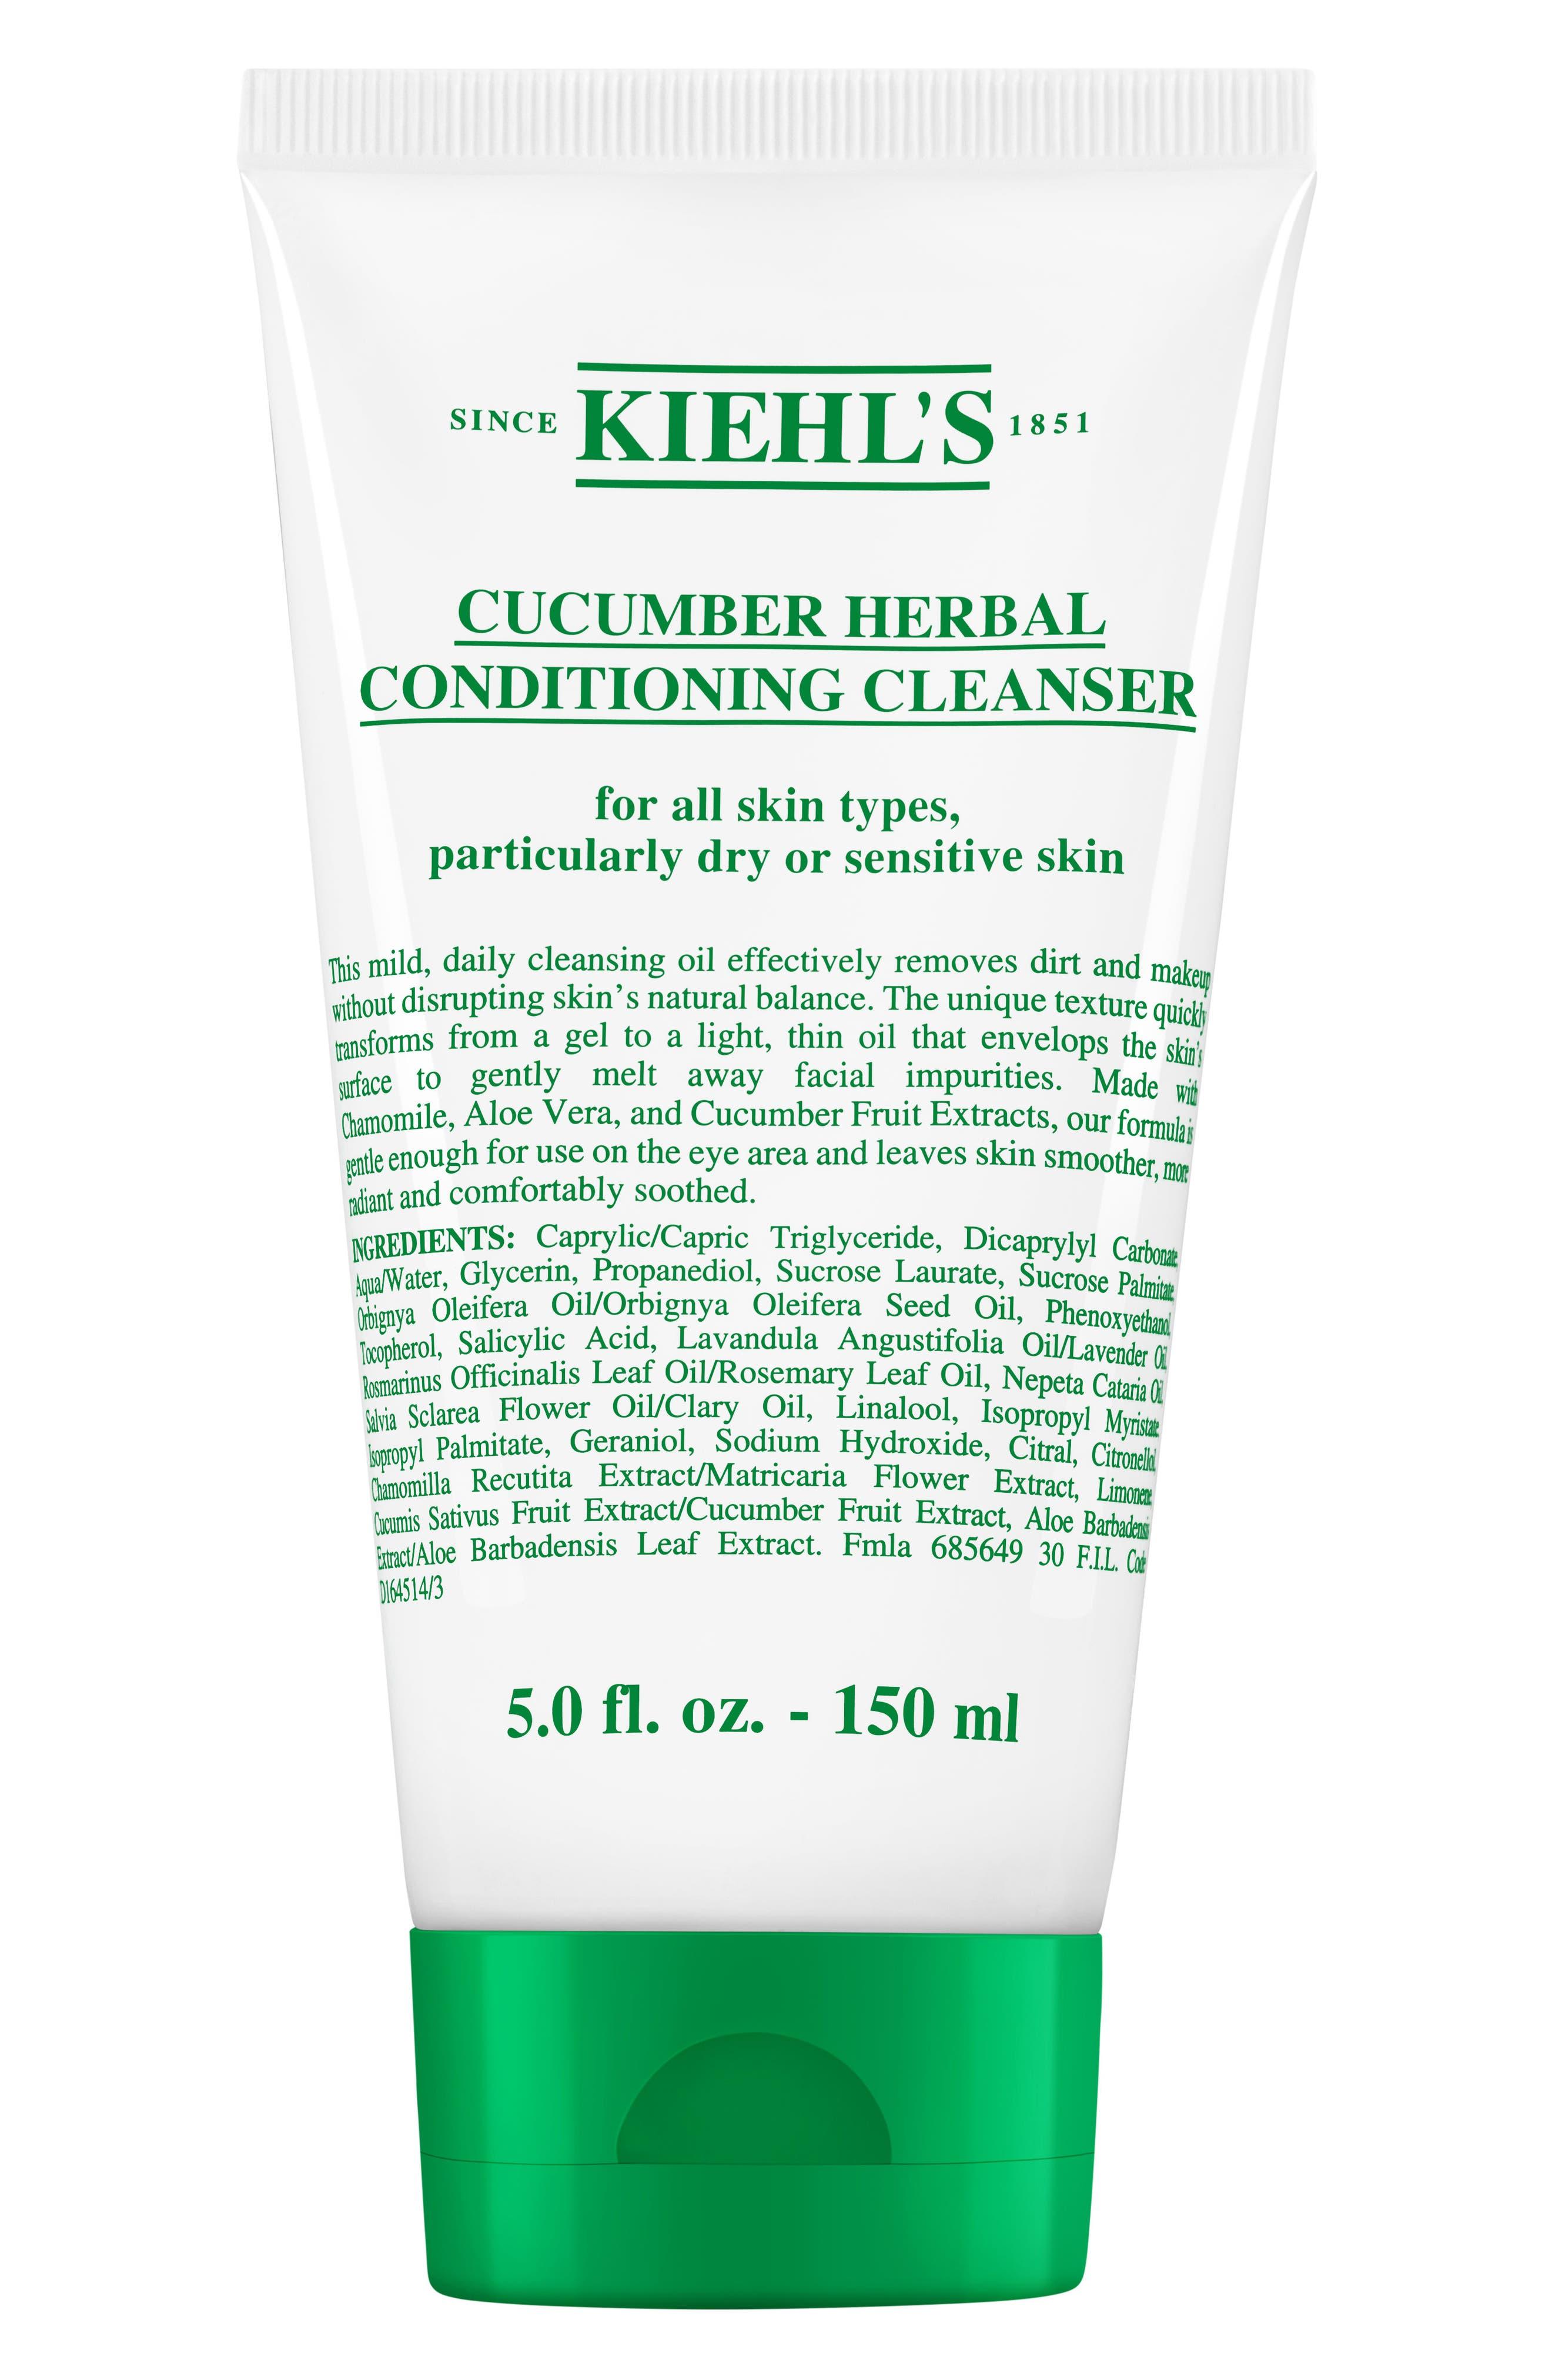 1851 Cucumber Herbal Cleanser